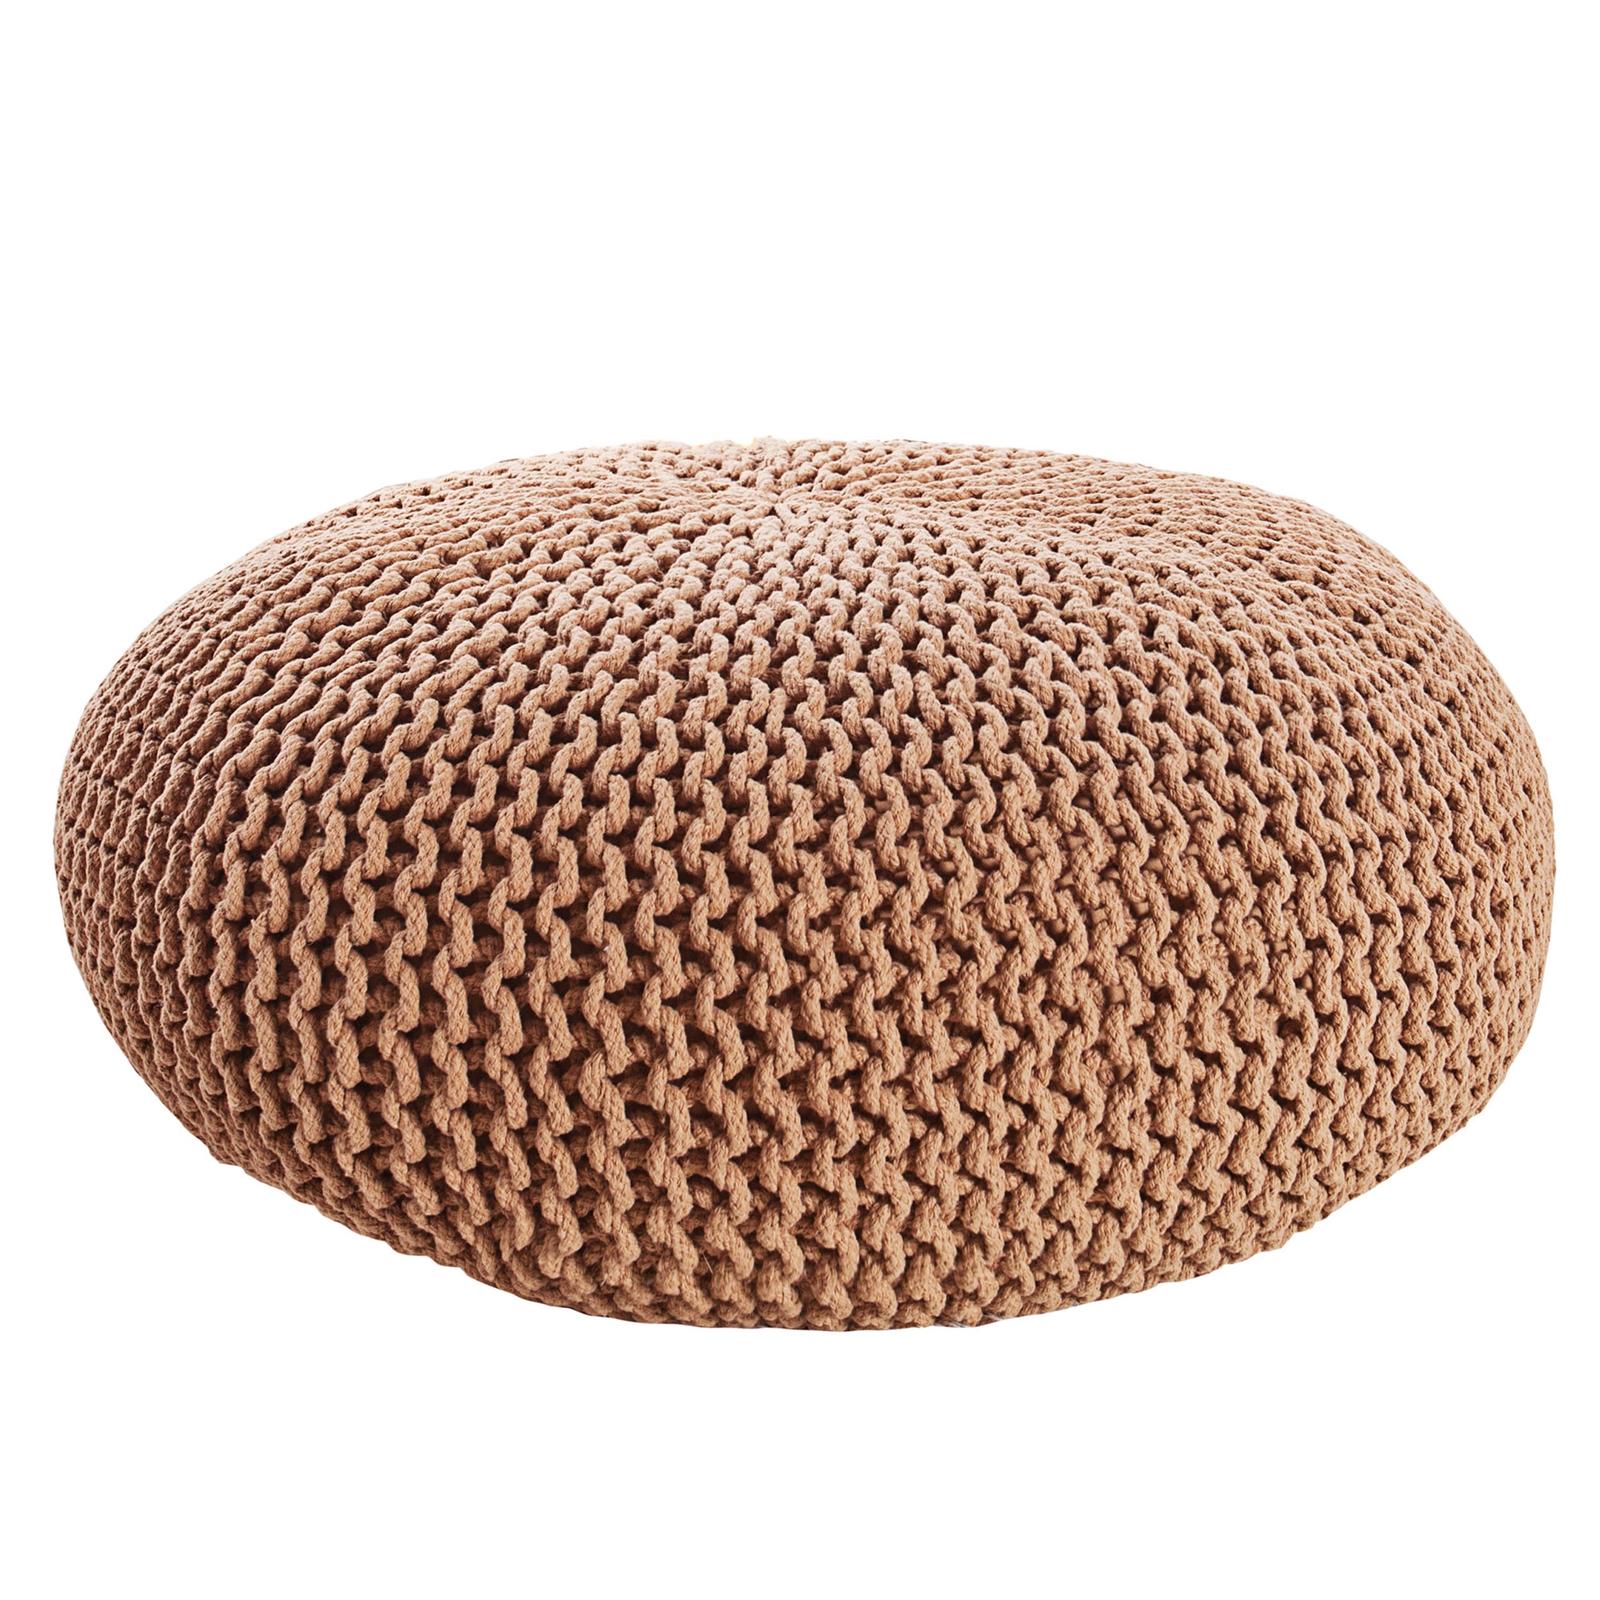 gem tlicher strick pouf liesel 50 cm coffee. Black Bedroom Furniture Sets. Home Design Ideas